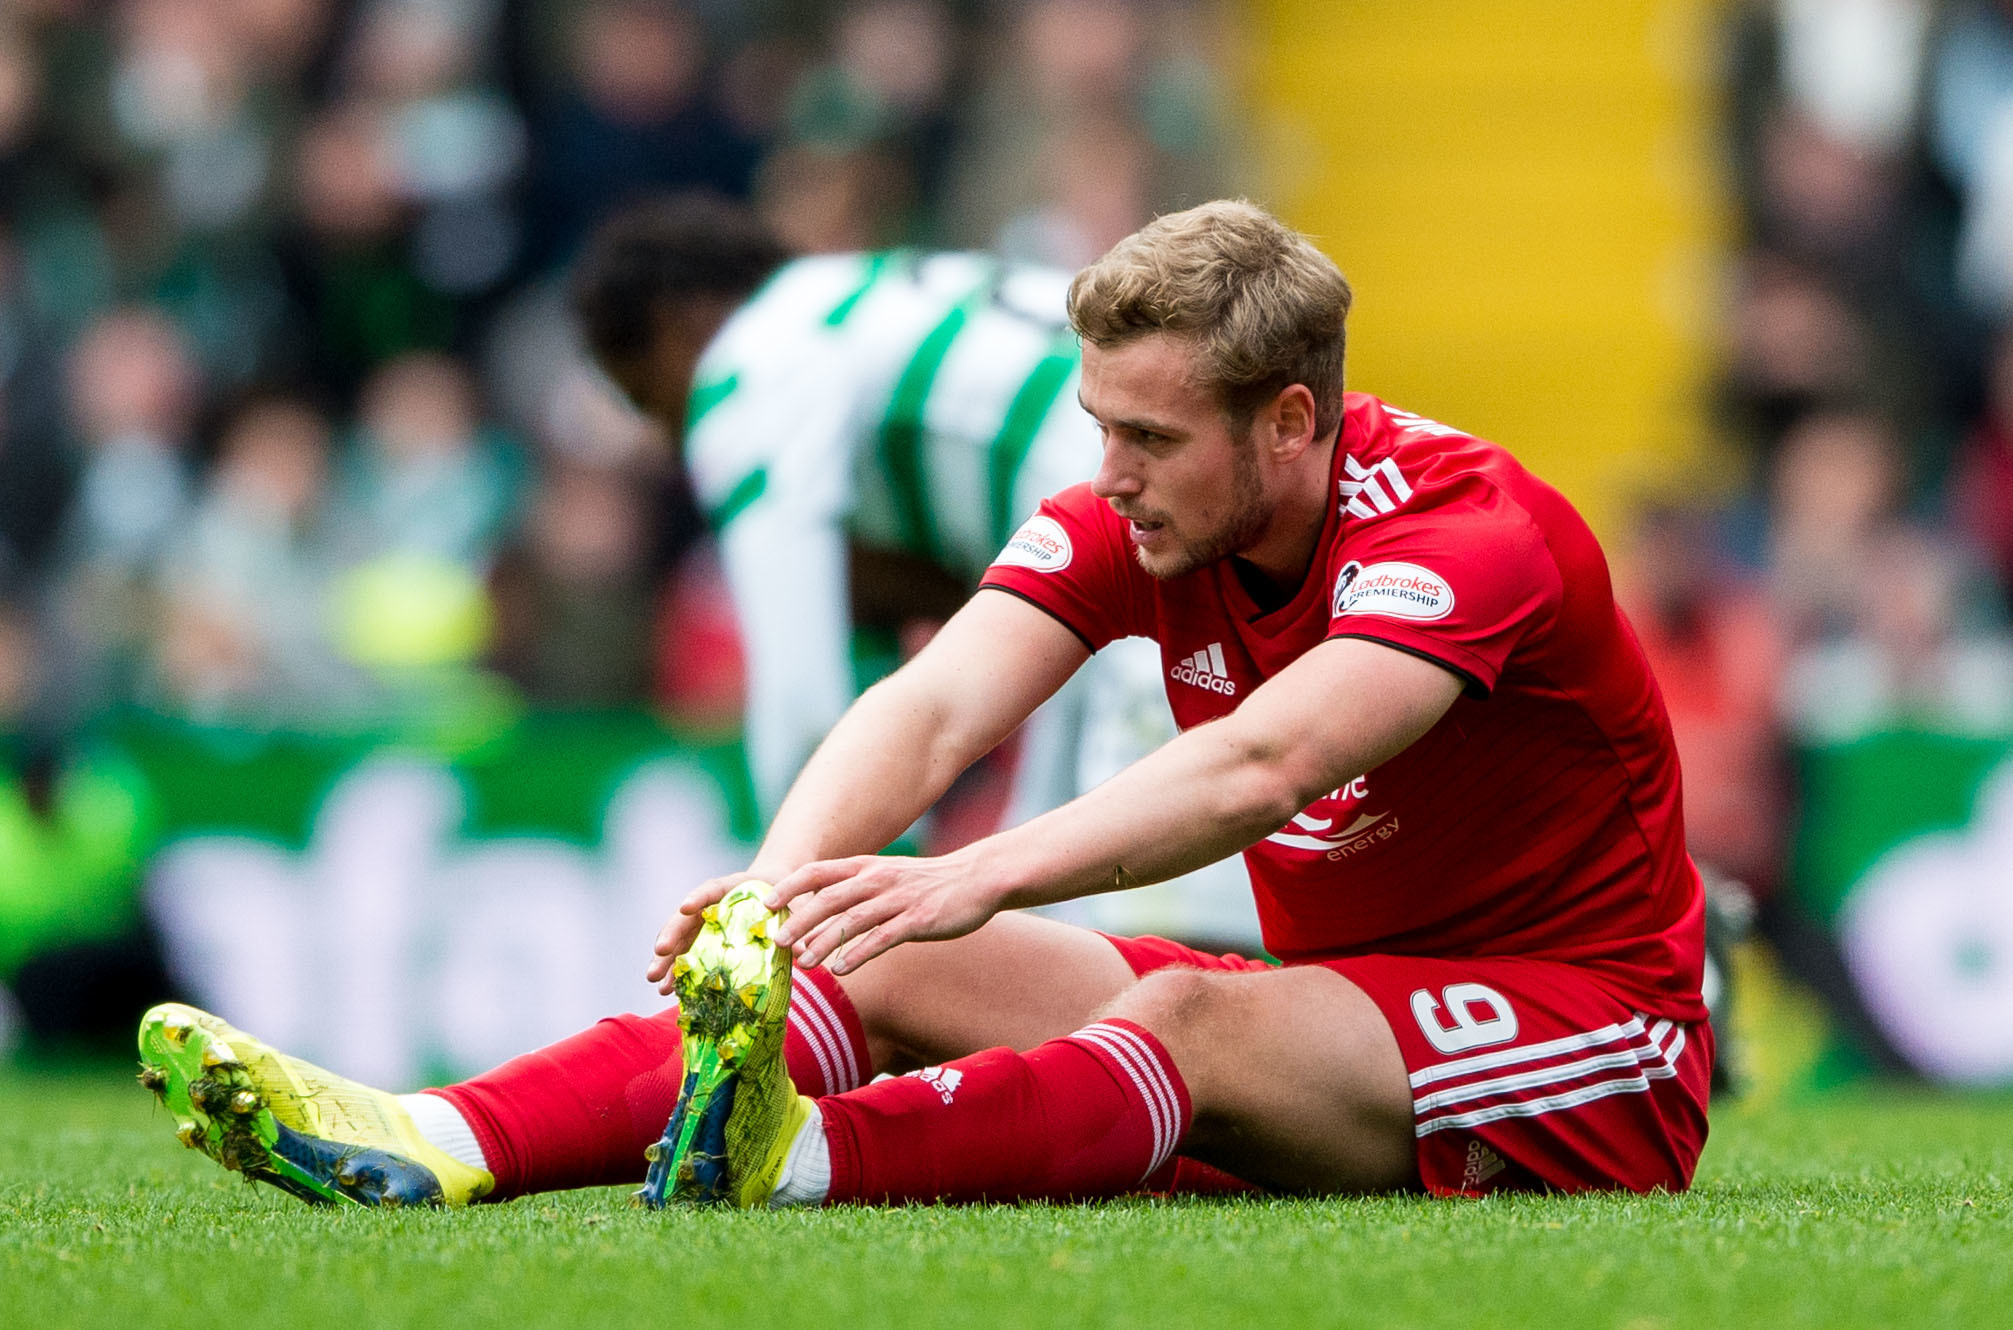 Aberdeen striker James Wilson is on loan from Manchester United.